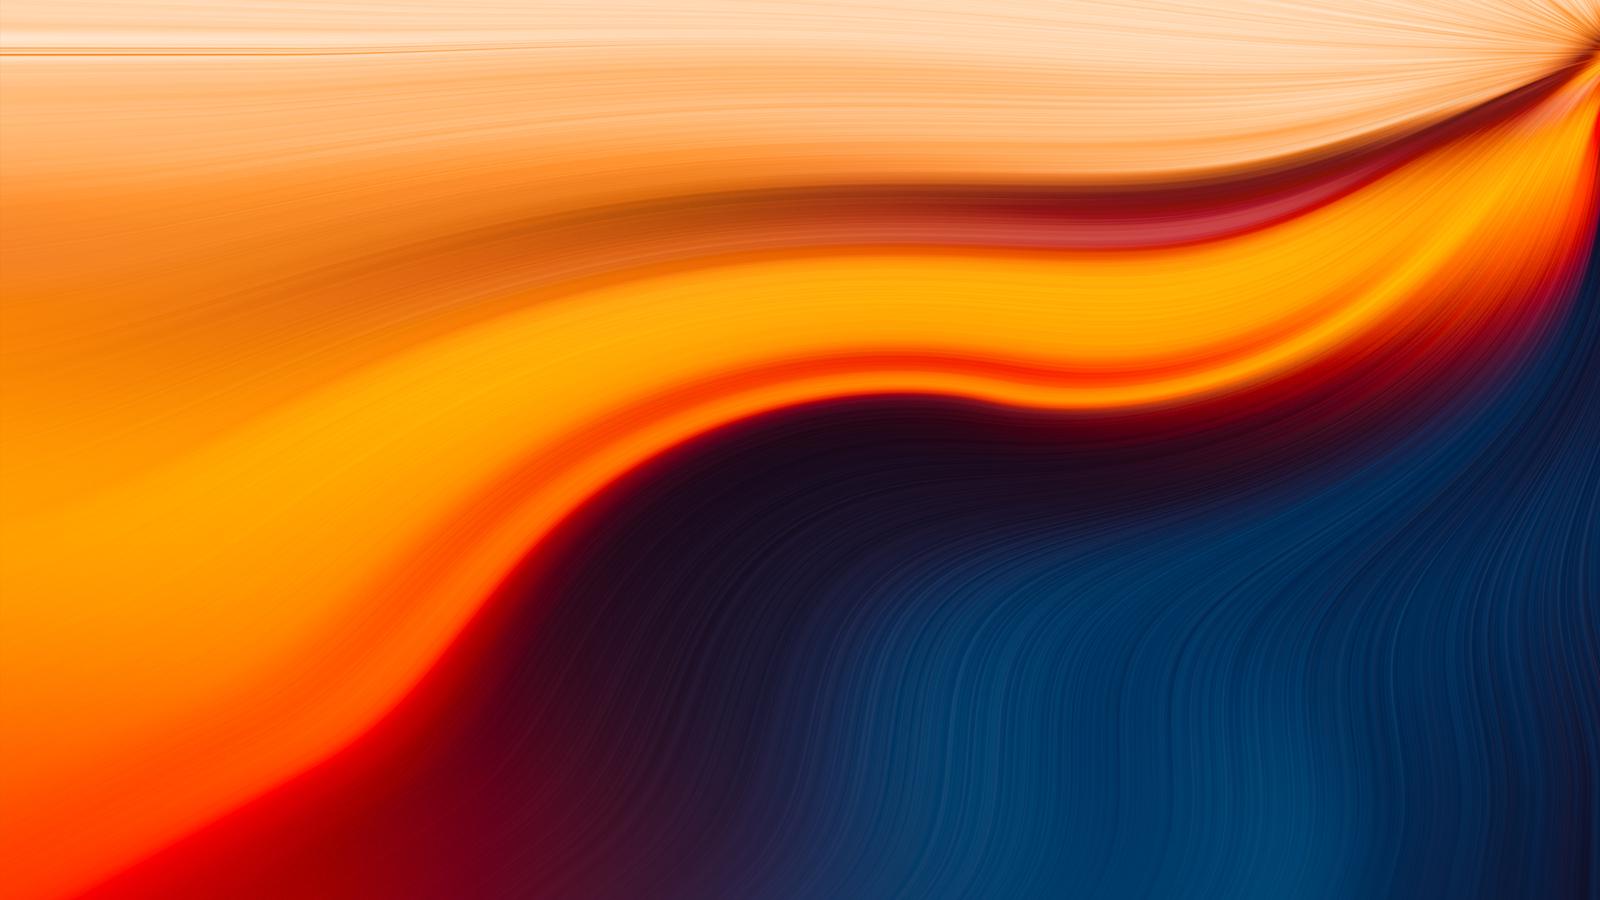 hole-colors-abstract-4k-xz.jpg